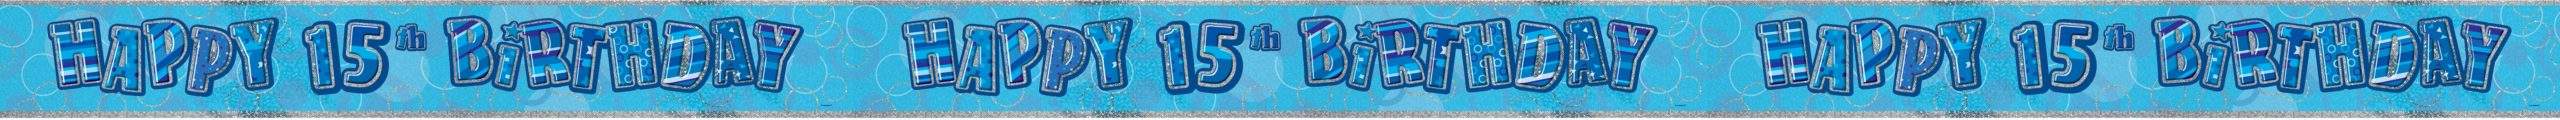 CB15BB1-1.jpg